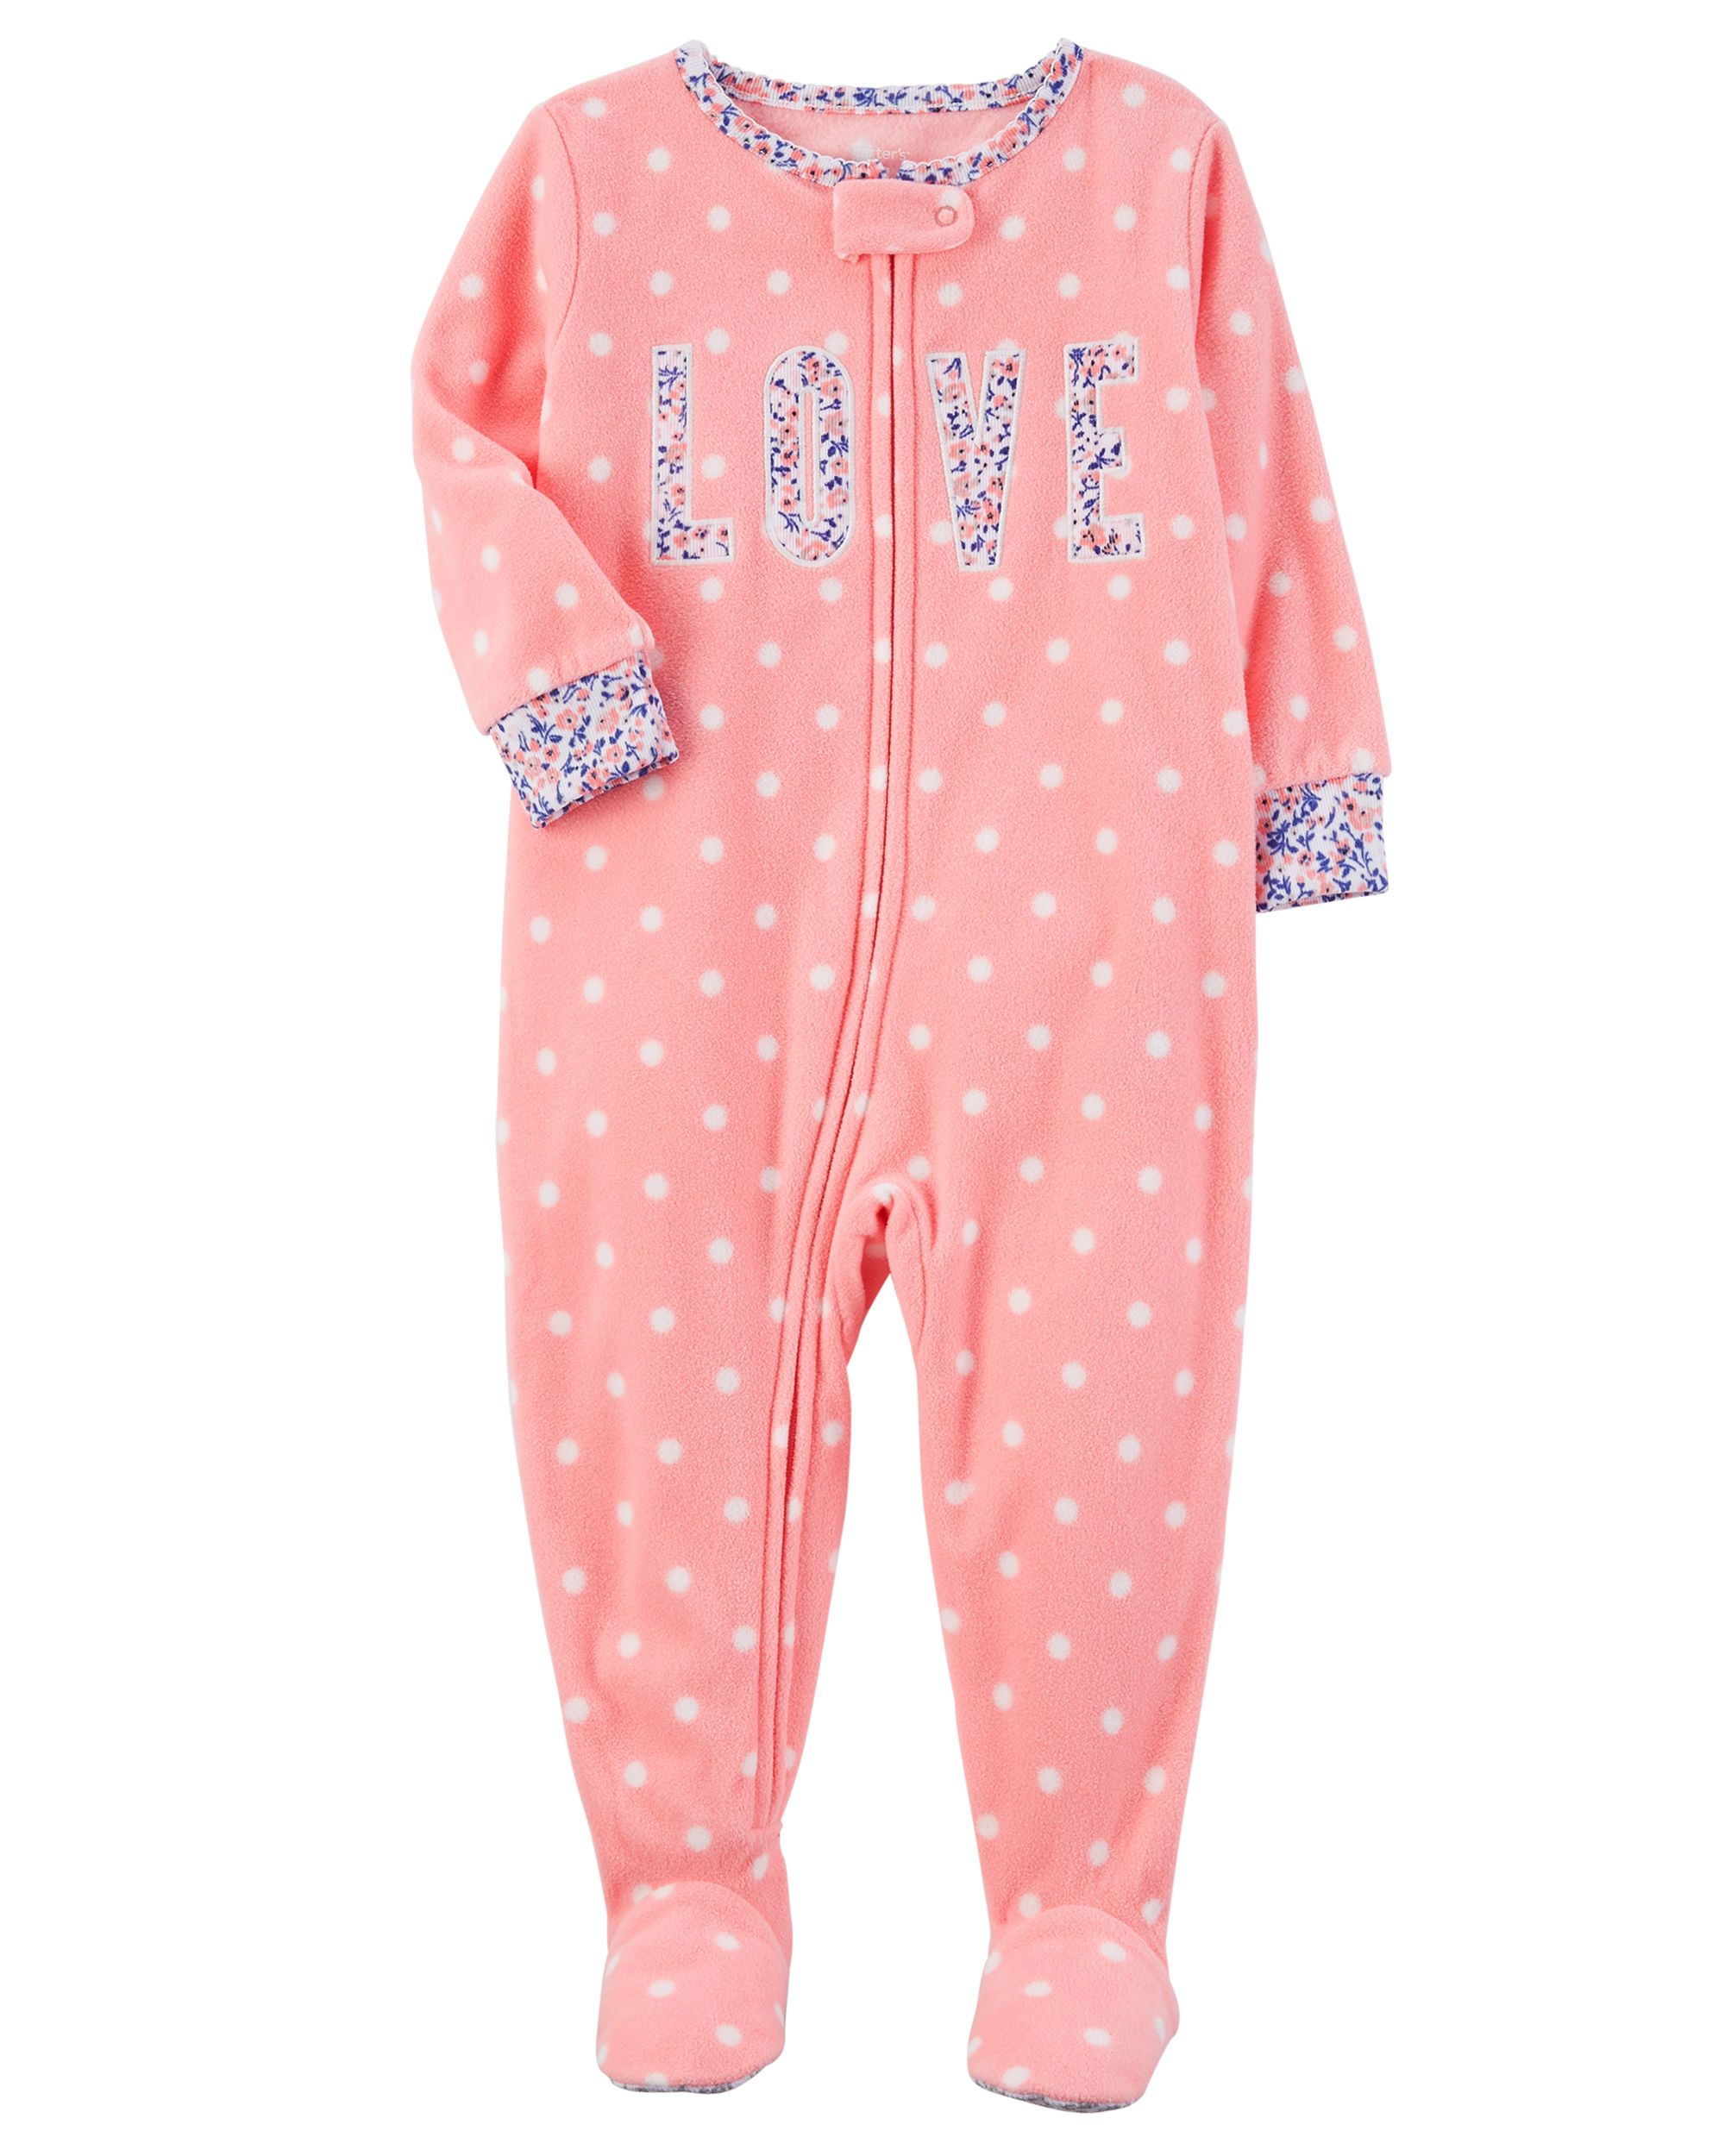 suit amazon hooded ame com piece sleeper sleepers union pajamas blanket one movie little dash girls adventure my rainbow pony dp